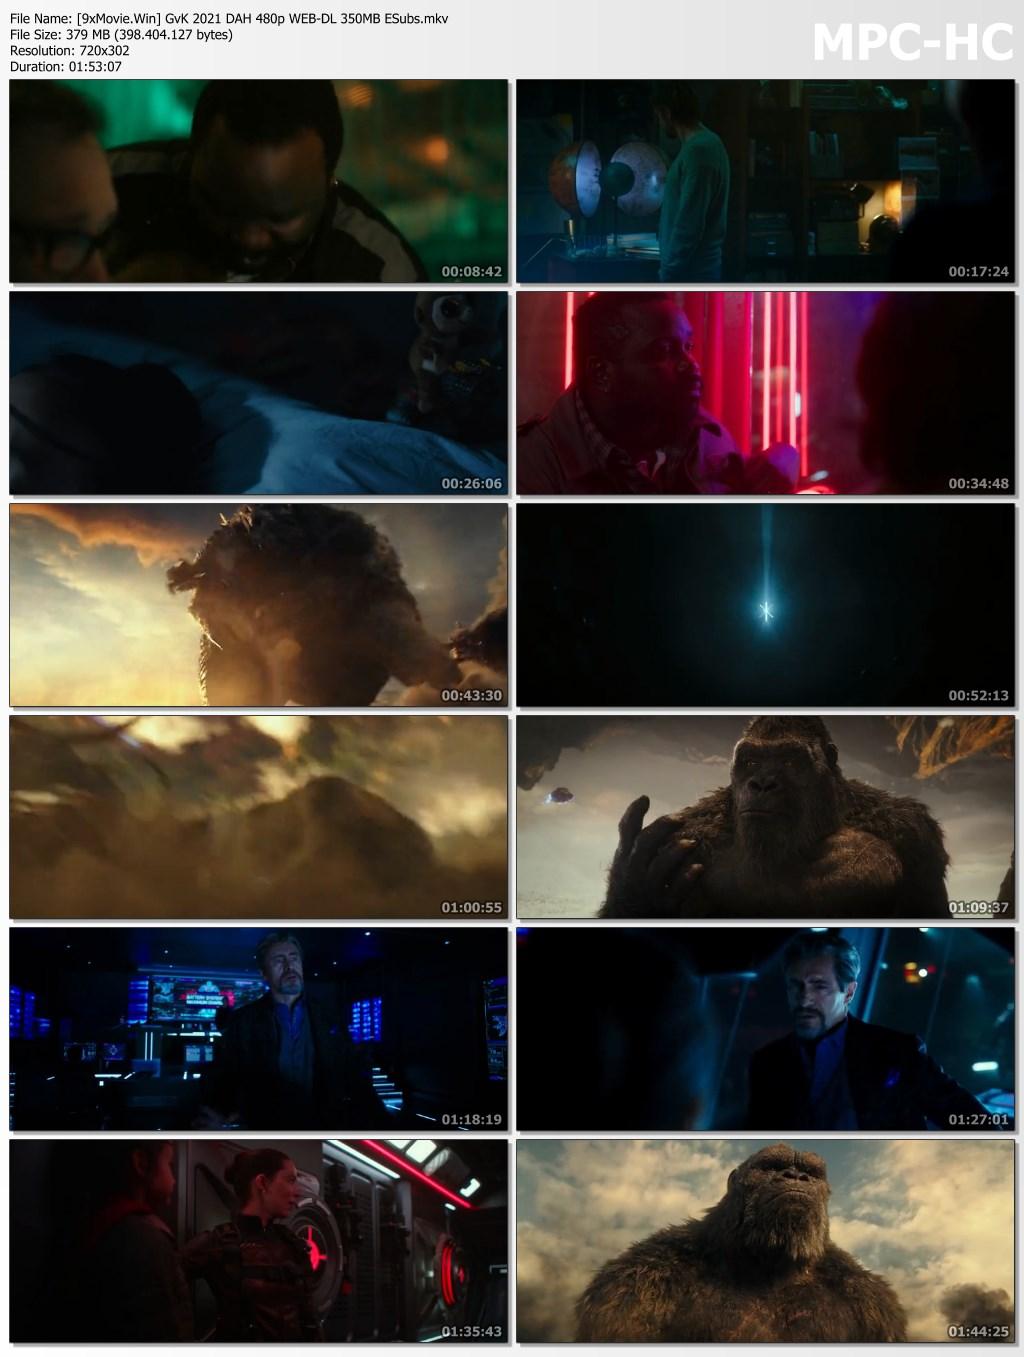 Godzilla vs. Kong 2021 Dual Audio Hindi 480p WEB-DL x264 350MB ESubs